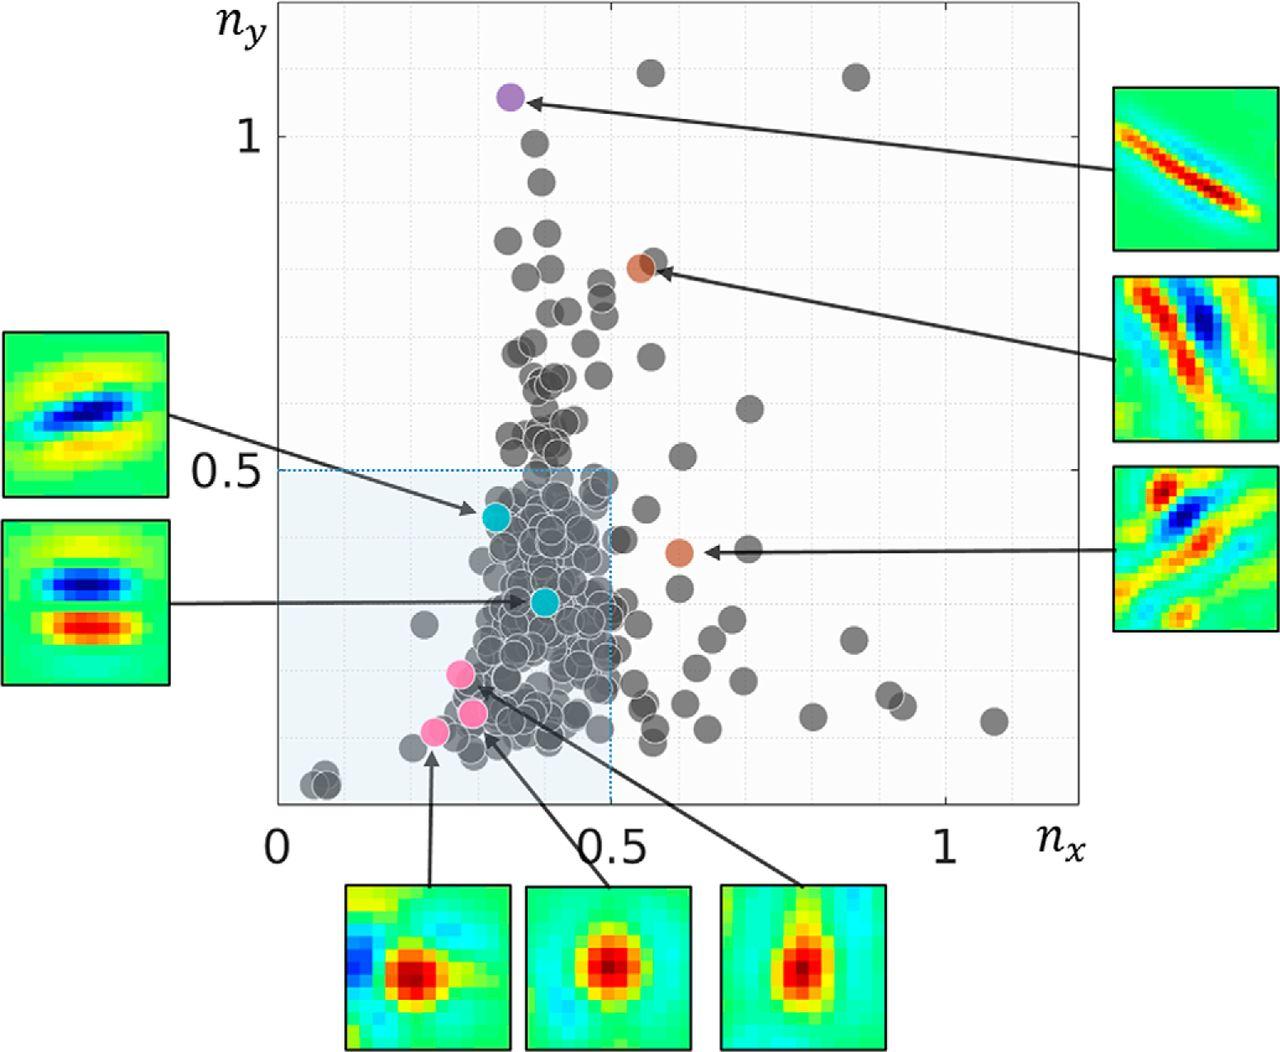 Emergence of Binocular Disparity Selectivity through Hebbian